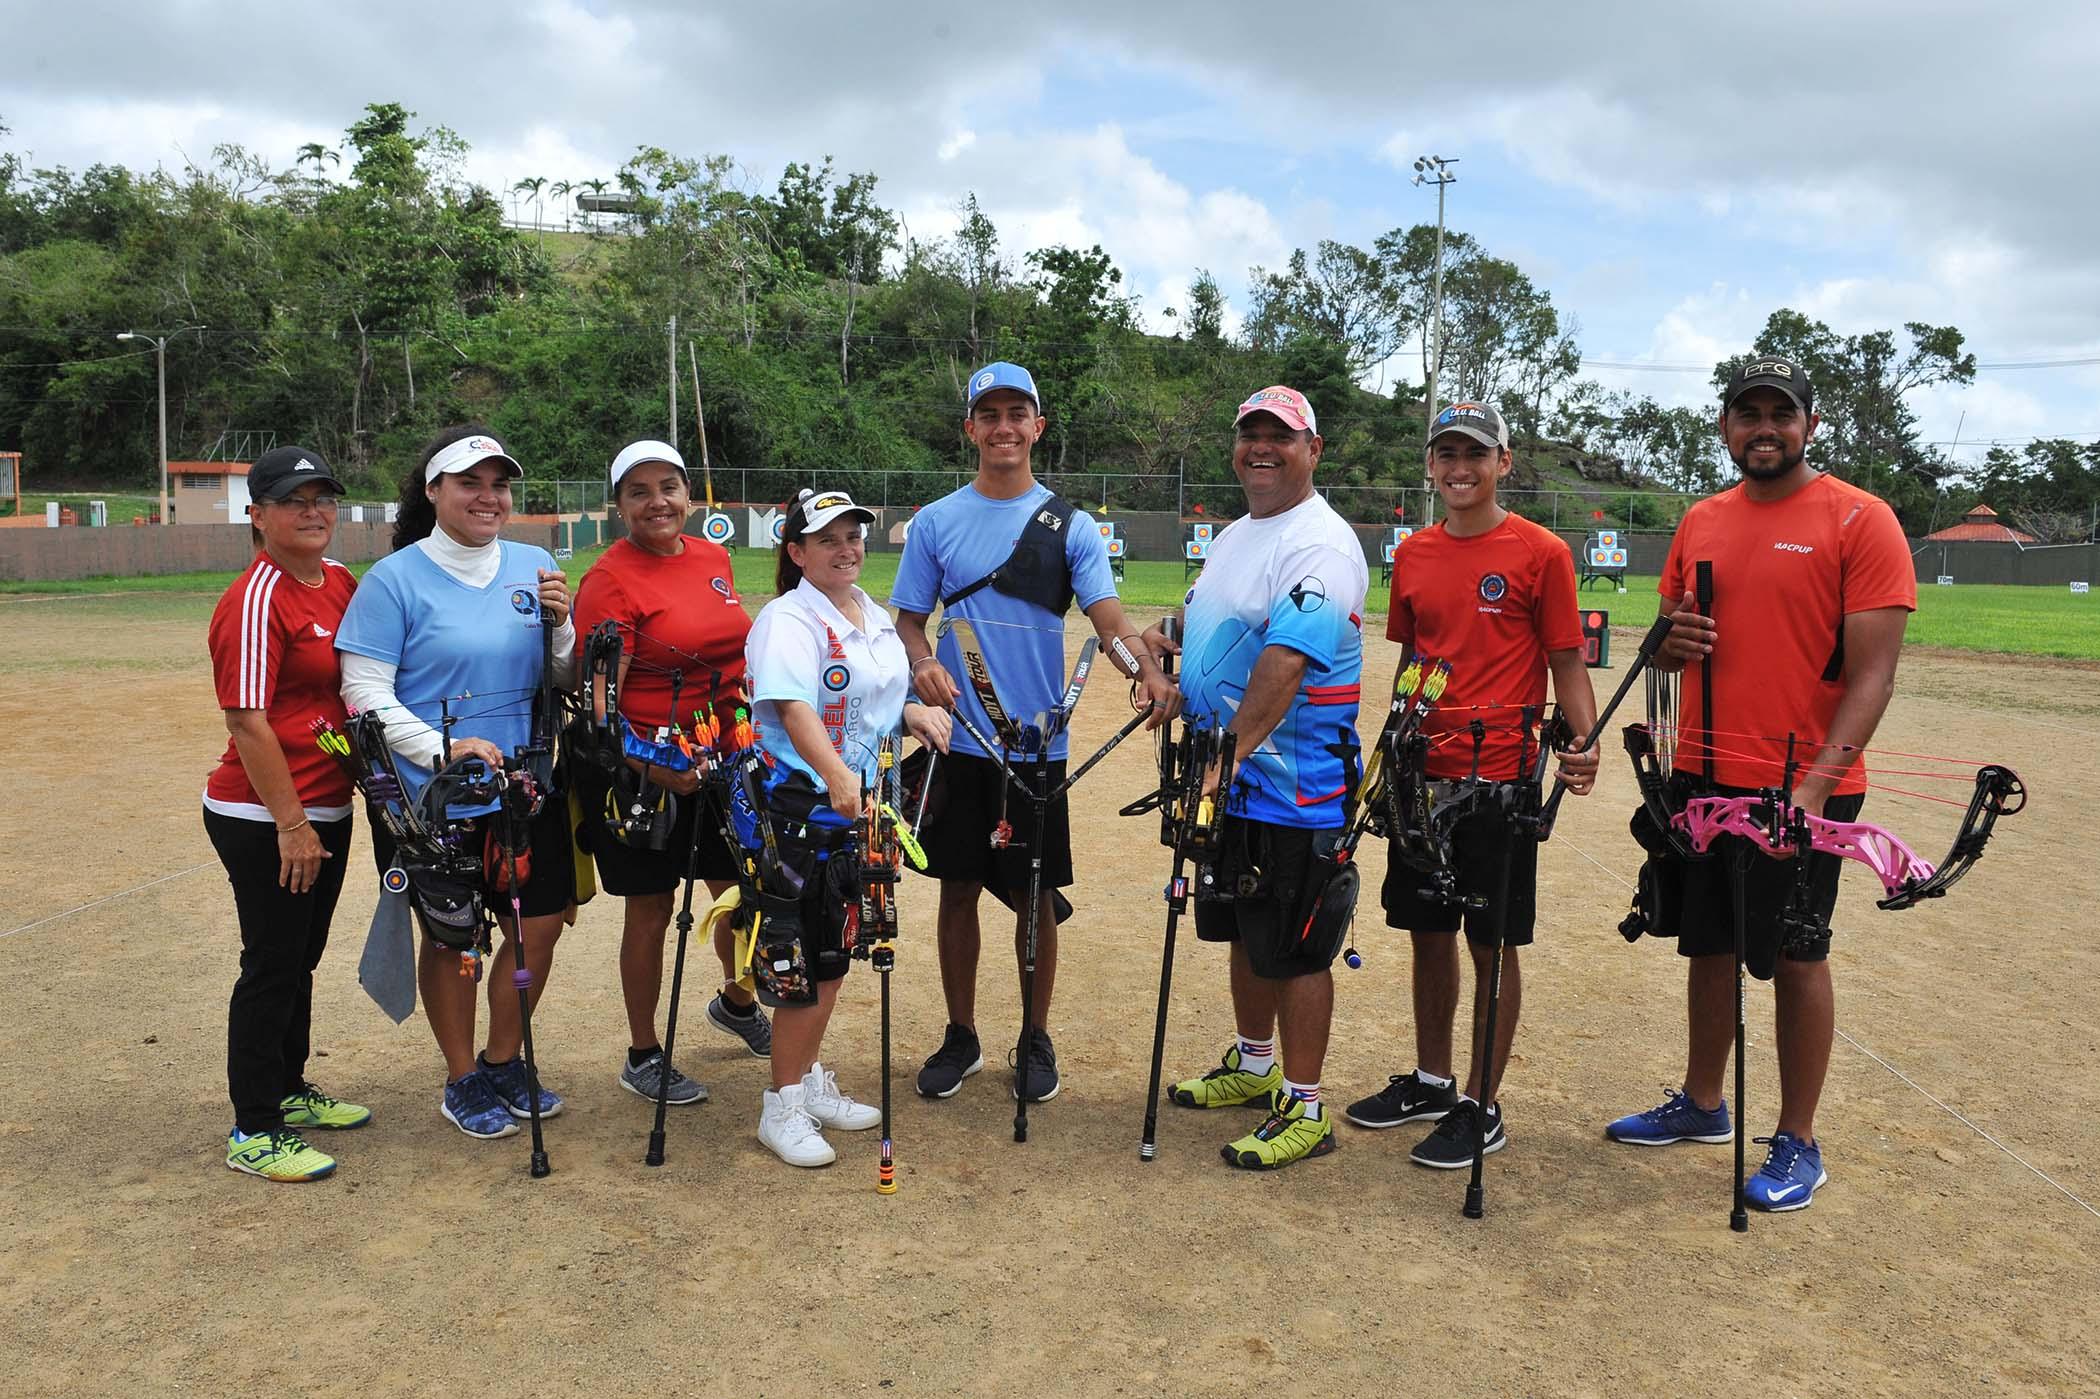 coach Maria Reyes-Marla Cintron-Maria Latorre-Nereida Velez-Adrian Munoz-Jose Reyes-Brian Alvarado-Jan Pizarro-1